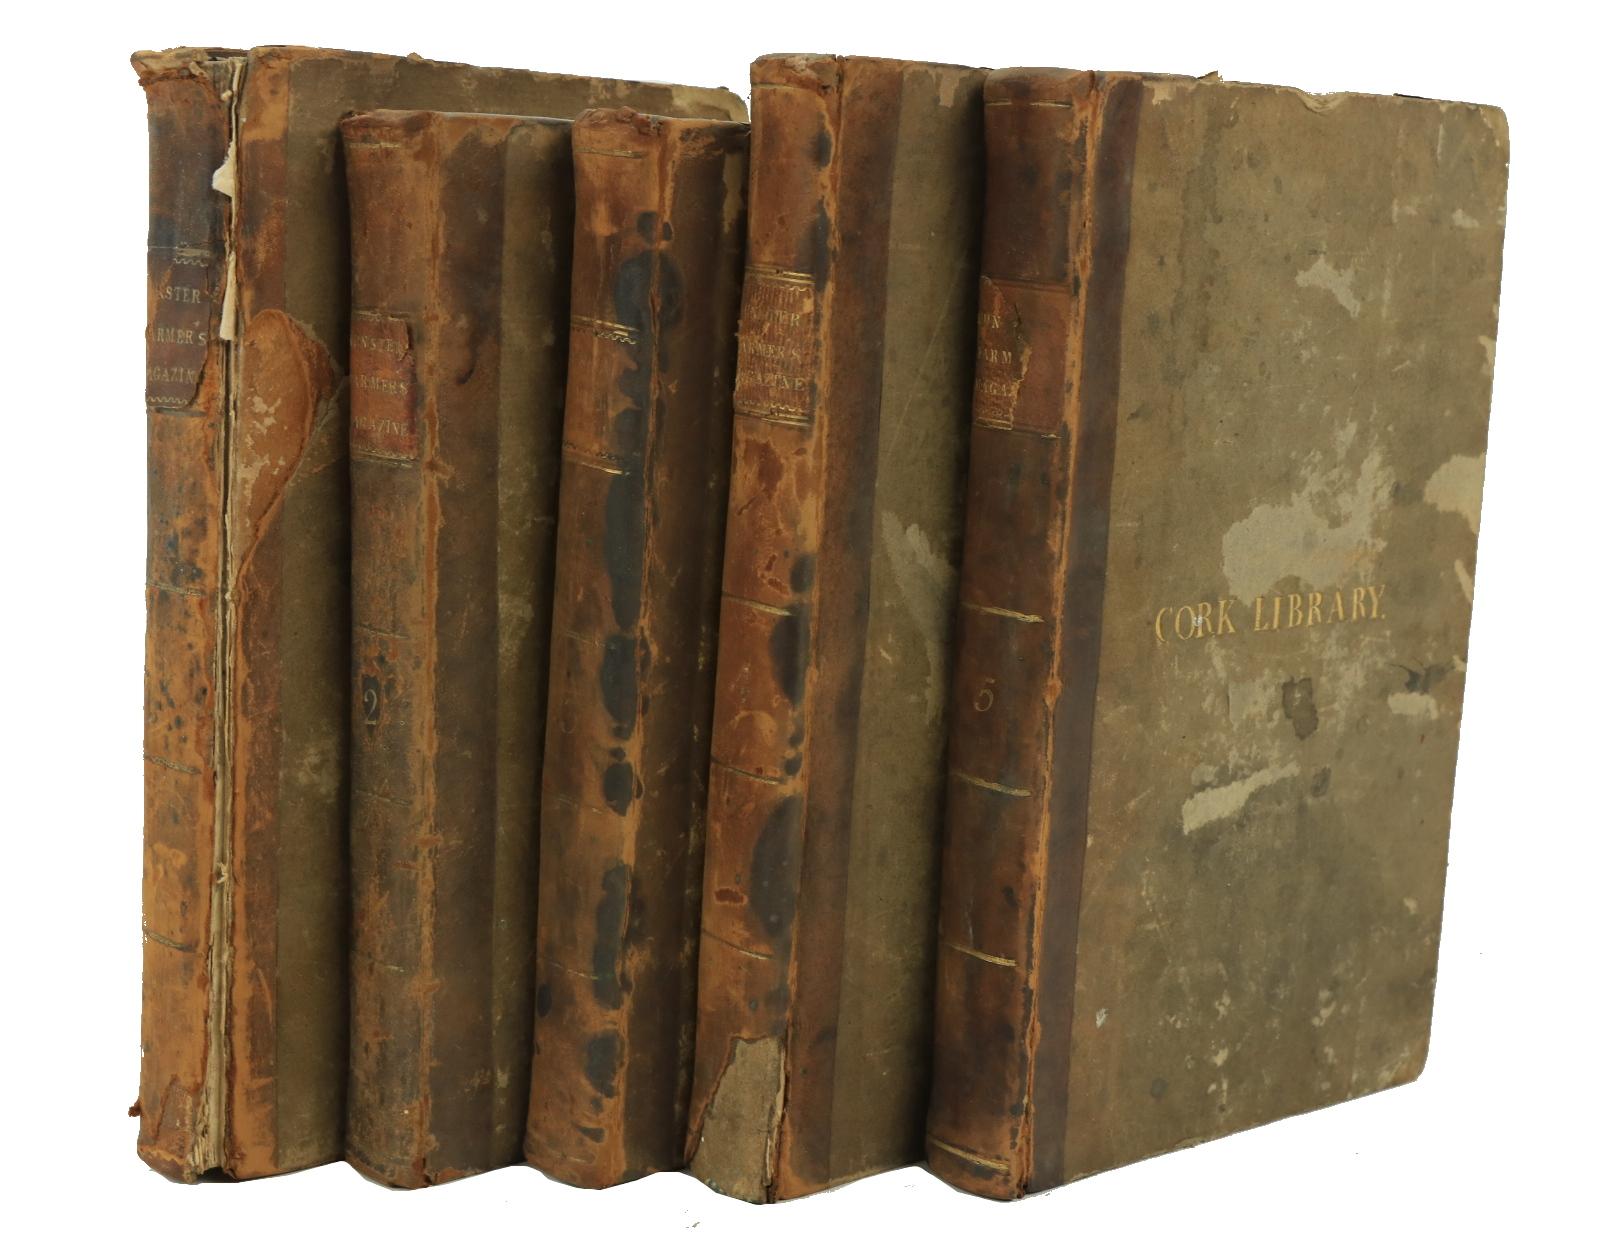 Rare Co. Cork Periodical Periodical: Cork Institution:The Munster Farmer's Magazine, Vols. 1 - 5.